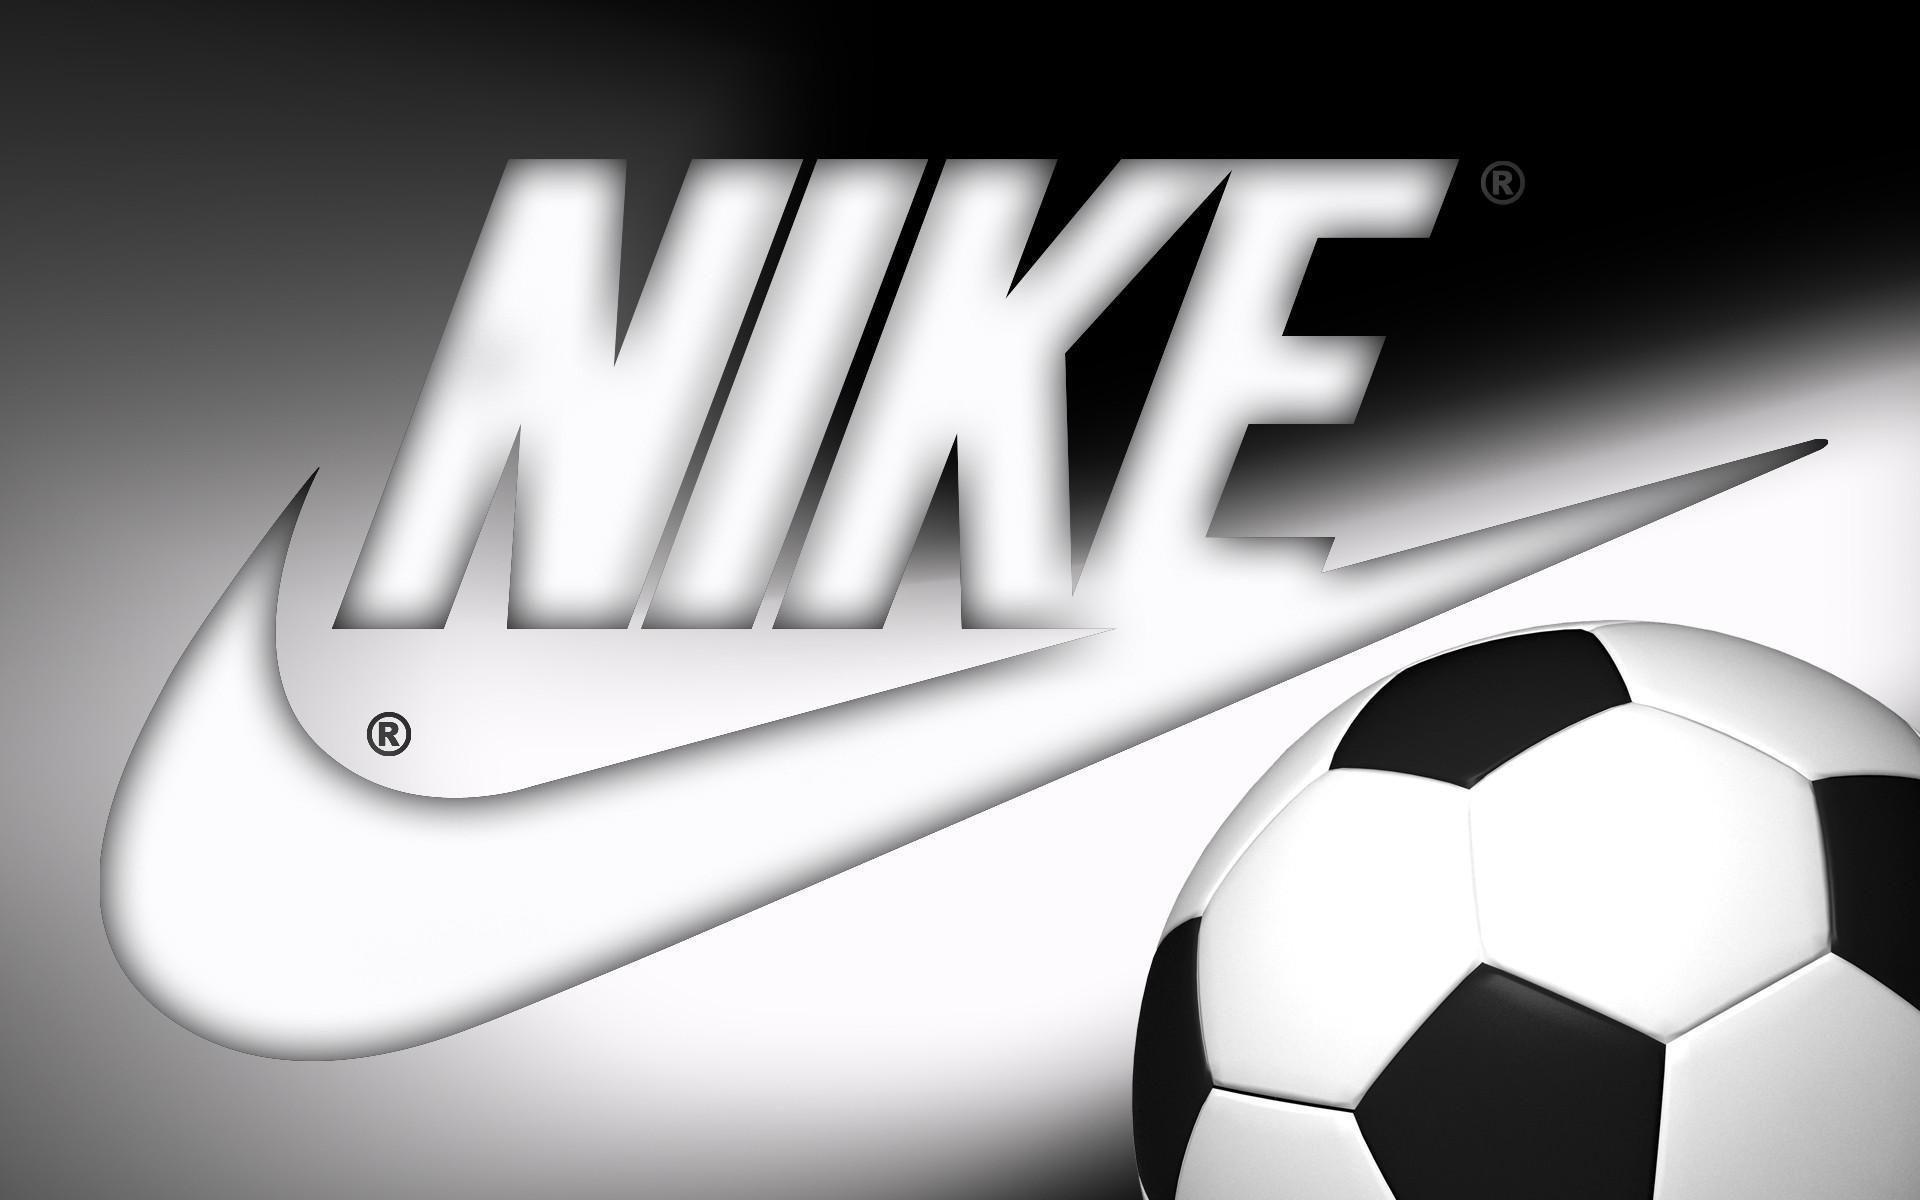 Iphone Nike Wallpaper Hd Jakubmroz Com